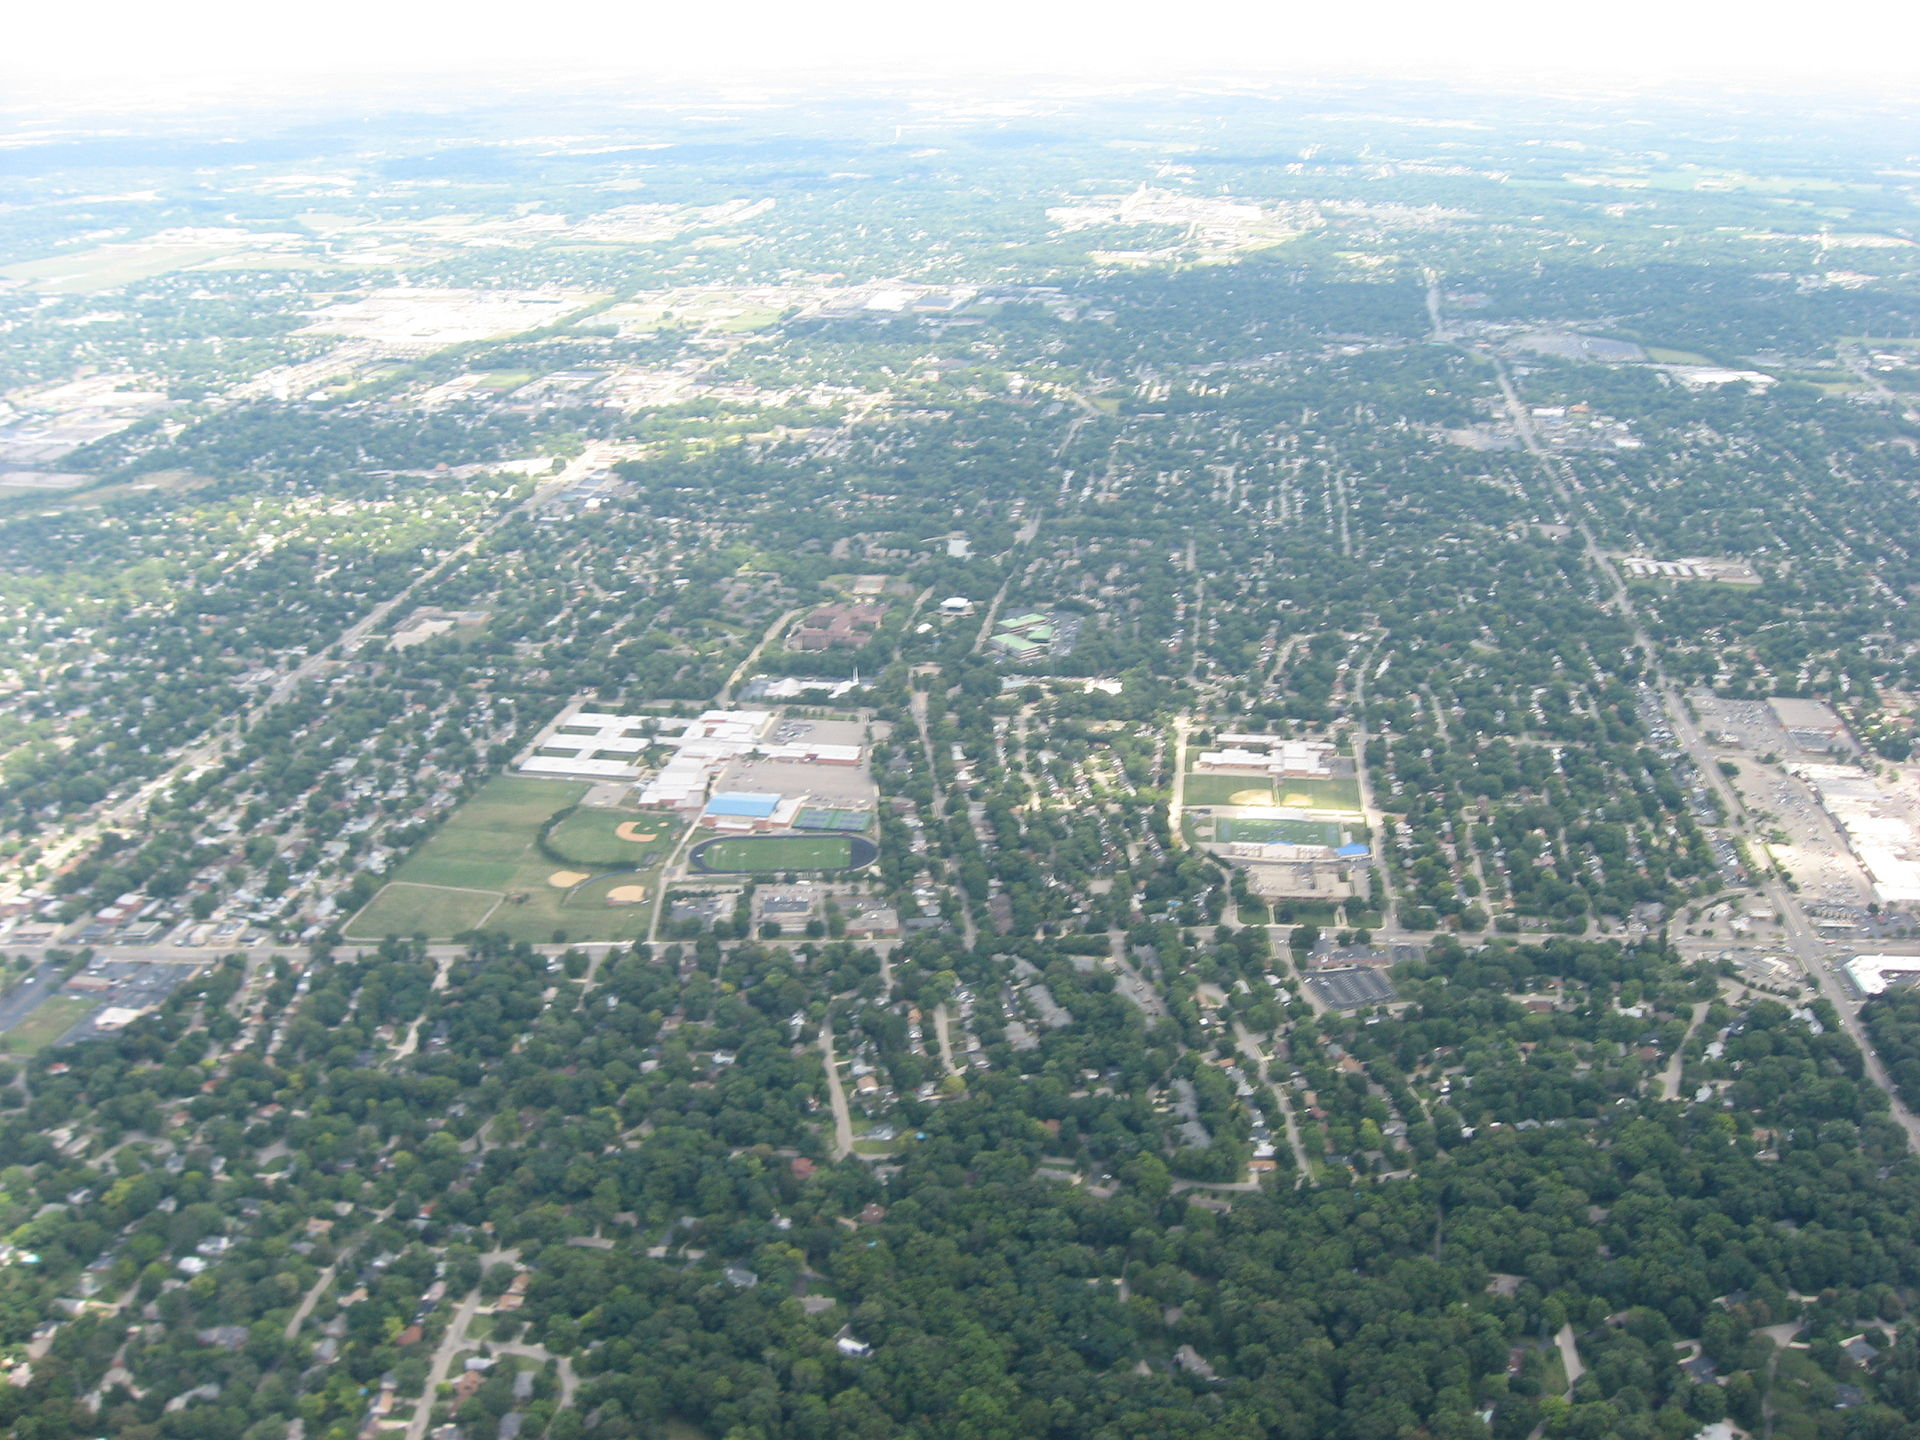 Kettering Brust Bewertungszentrum Kettering Ohio